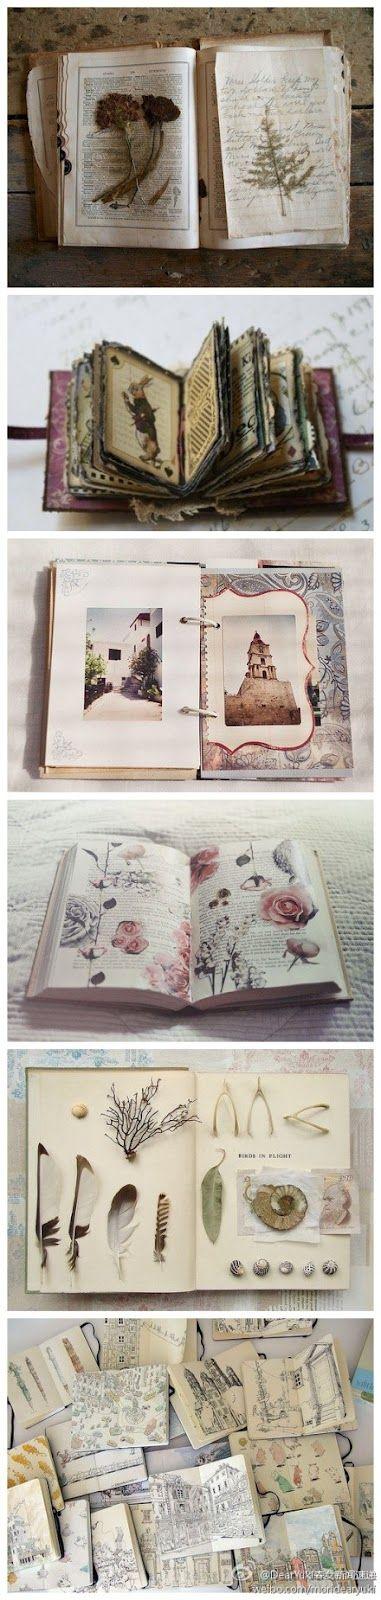 © Dear Yuki     http://weibo.com/moridearyuki     via:  Karin's passie..: april 2012